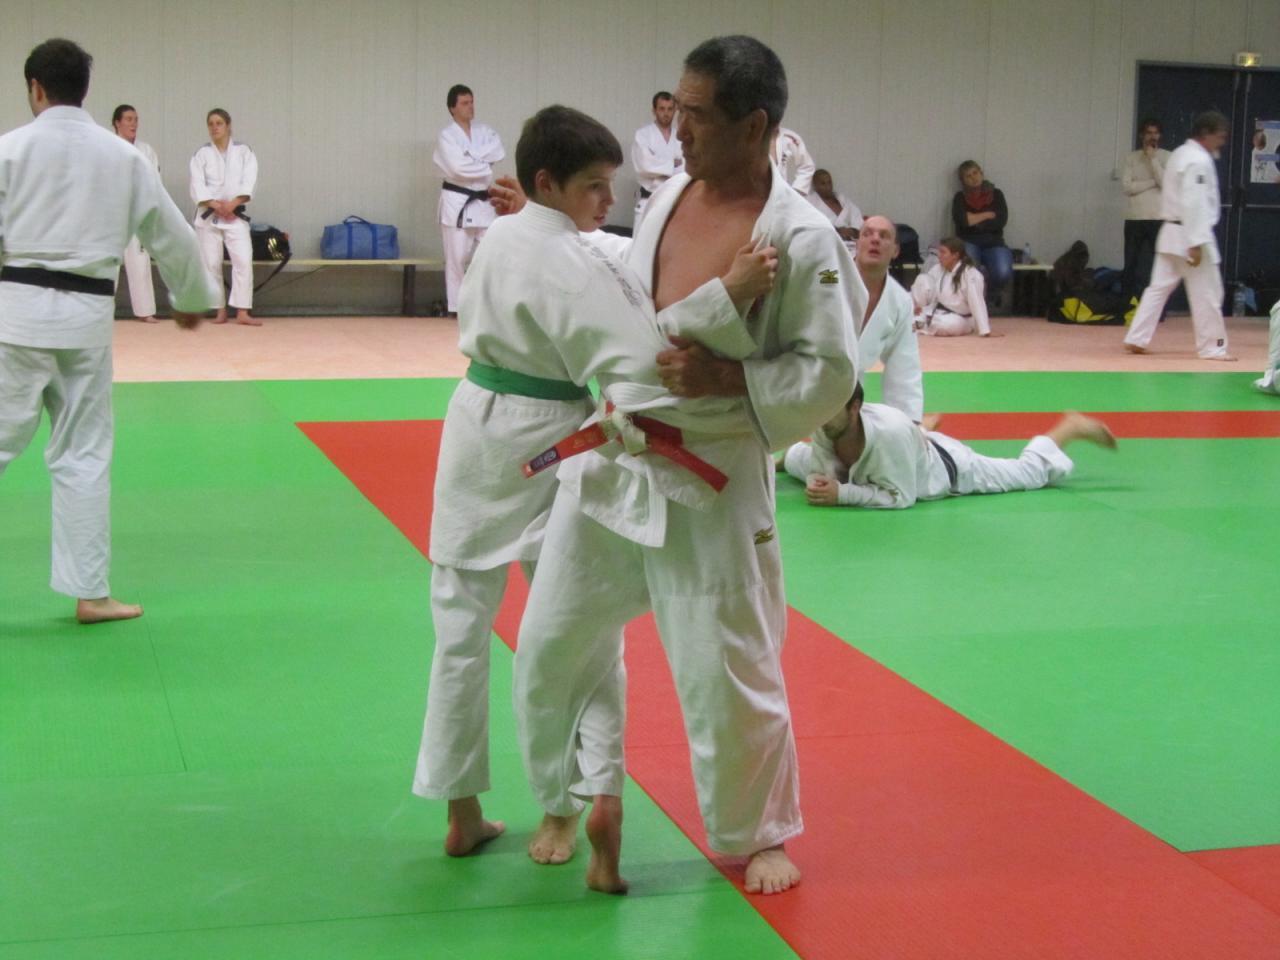 8ème stage Judo Sarreguemines 2013